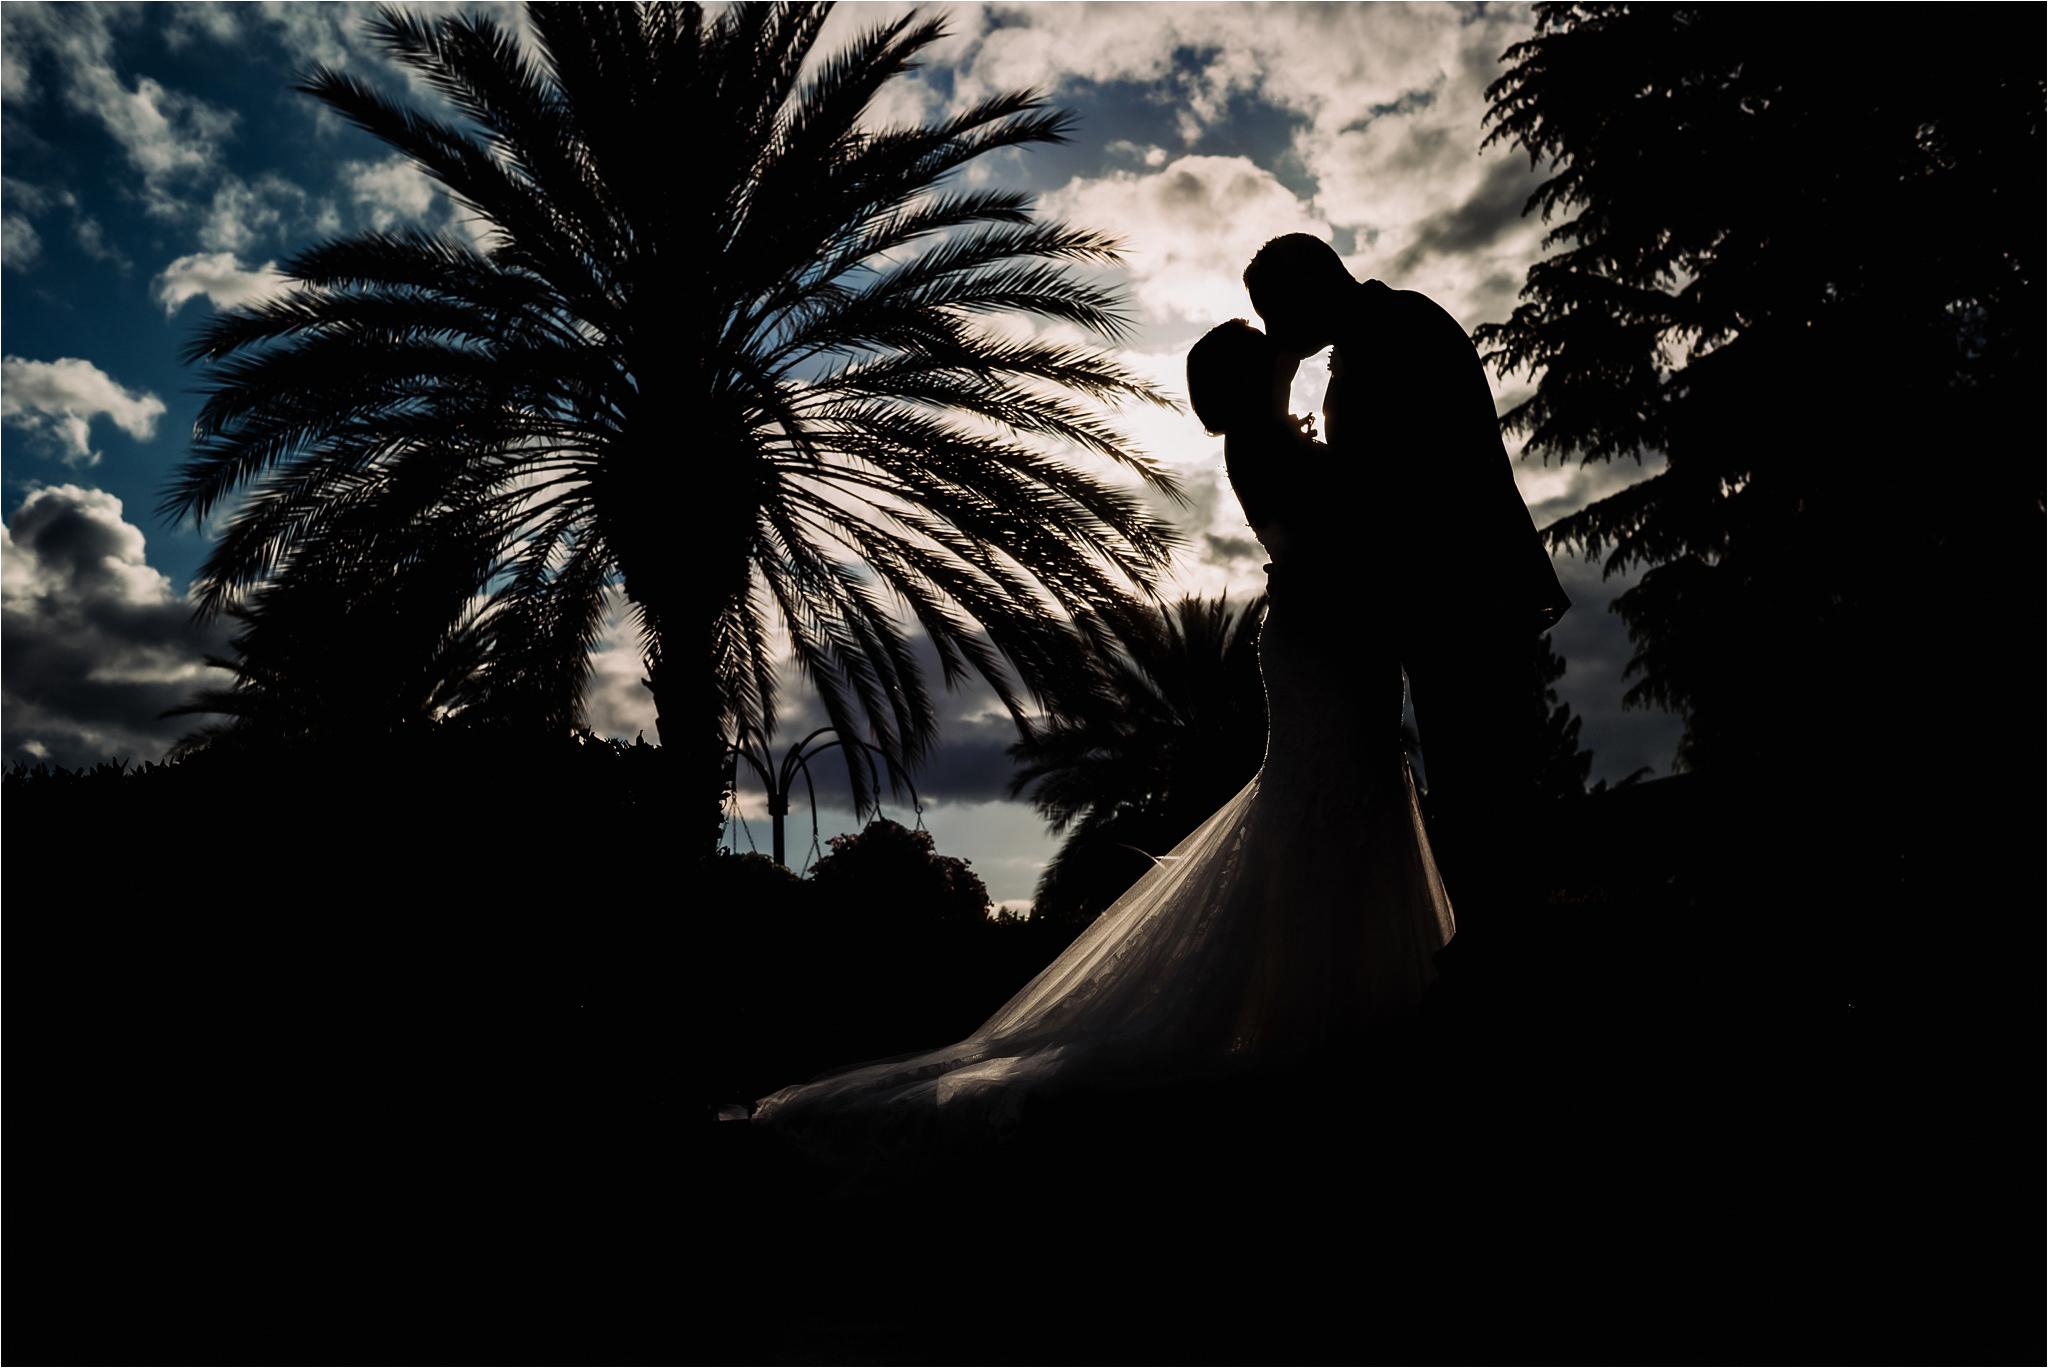 jessica-roman-photography-arden hills wedding photograpger-sacramento-boise-33.jpg